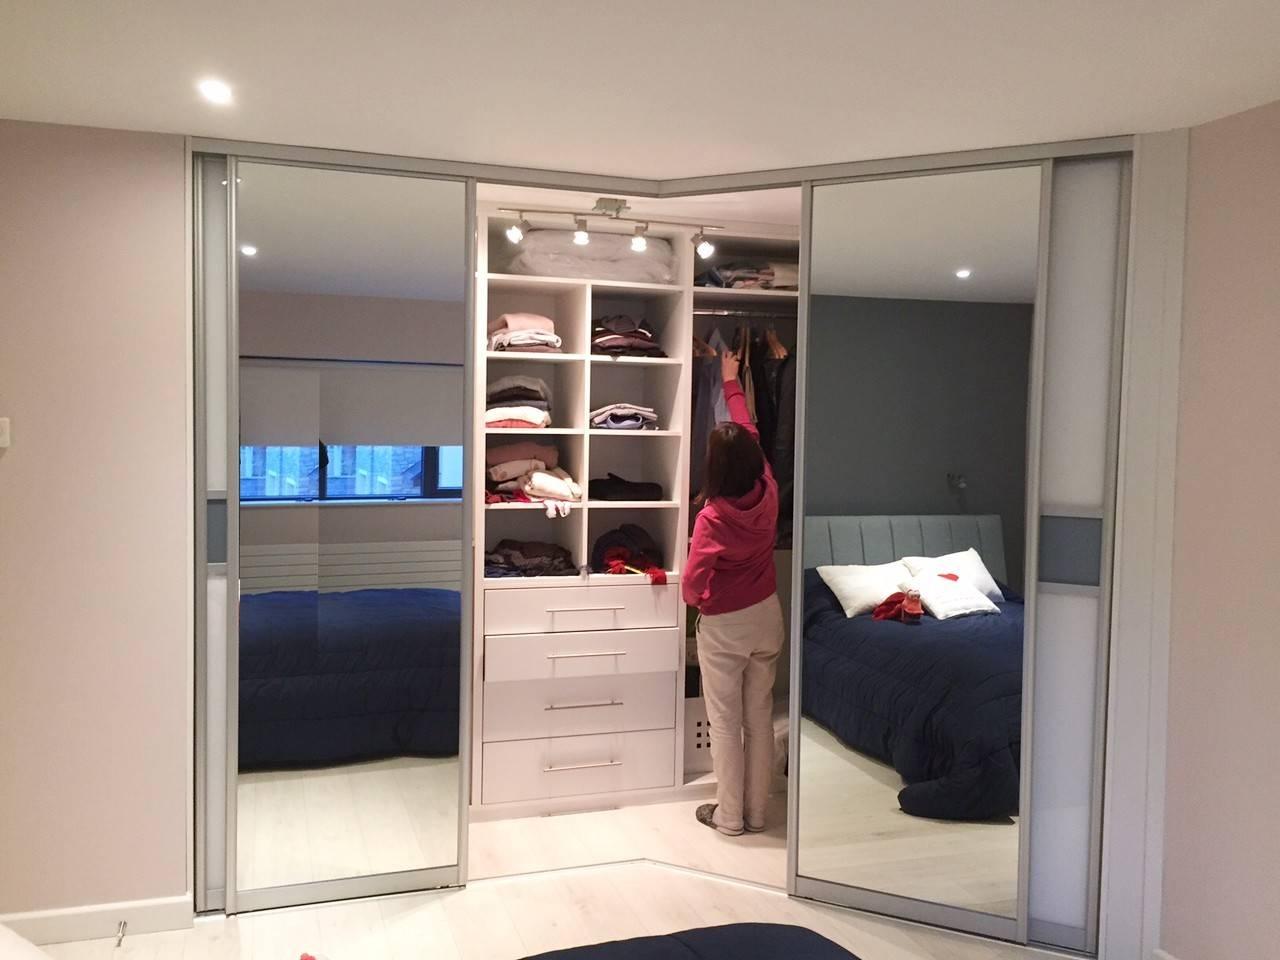 Irregular Corner Wardrobe | Slideglide - Sliding Wardrobes And pertaining to Corner Wardrobes (Image 10 of 15)